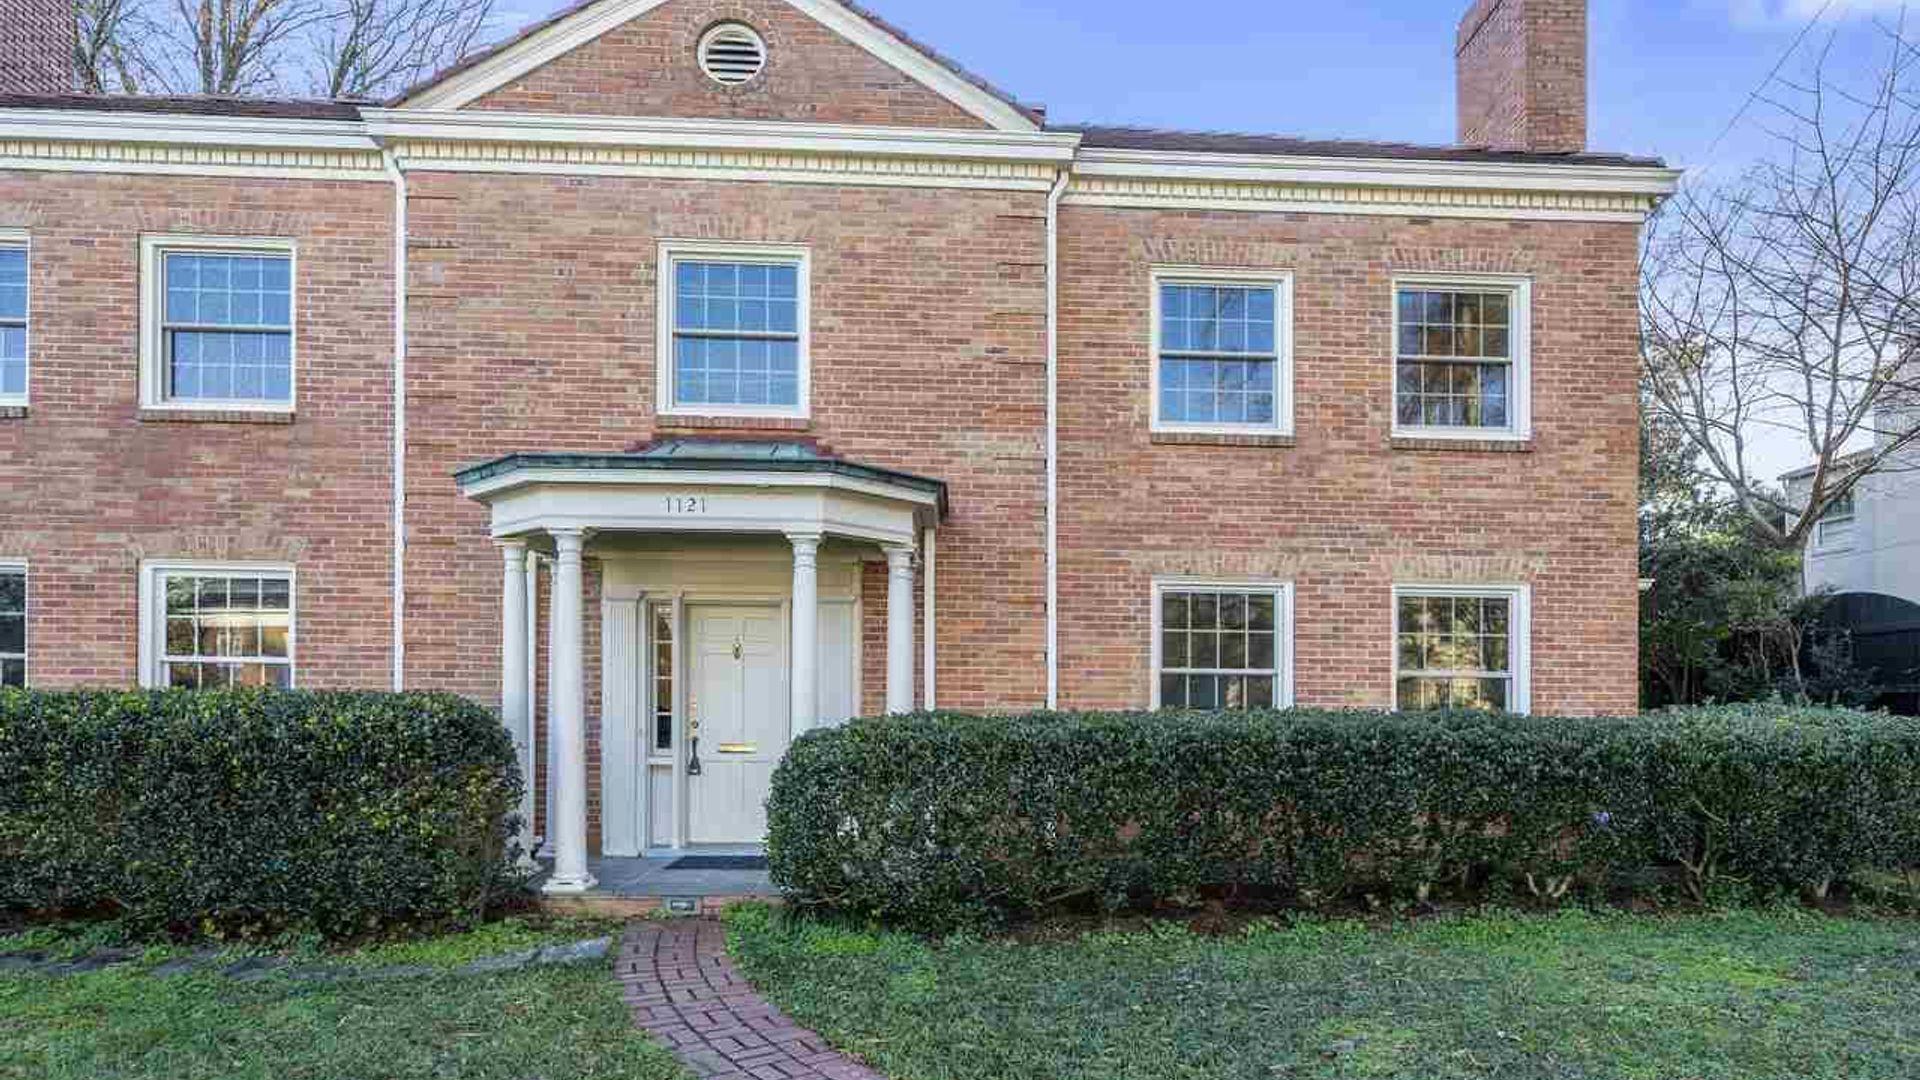 3-bed duplex at 1121 Harvey Street, Raleigh, NC 27608, USA ...